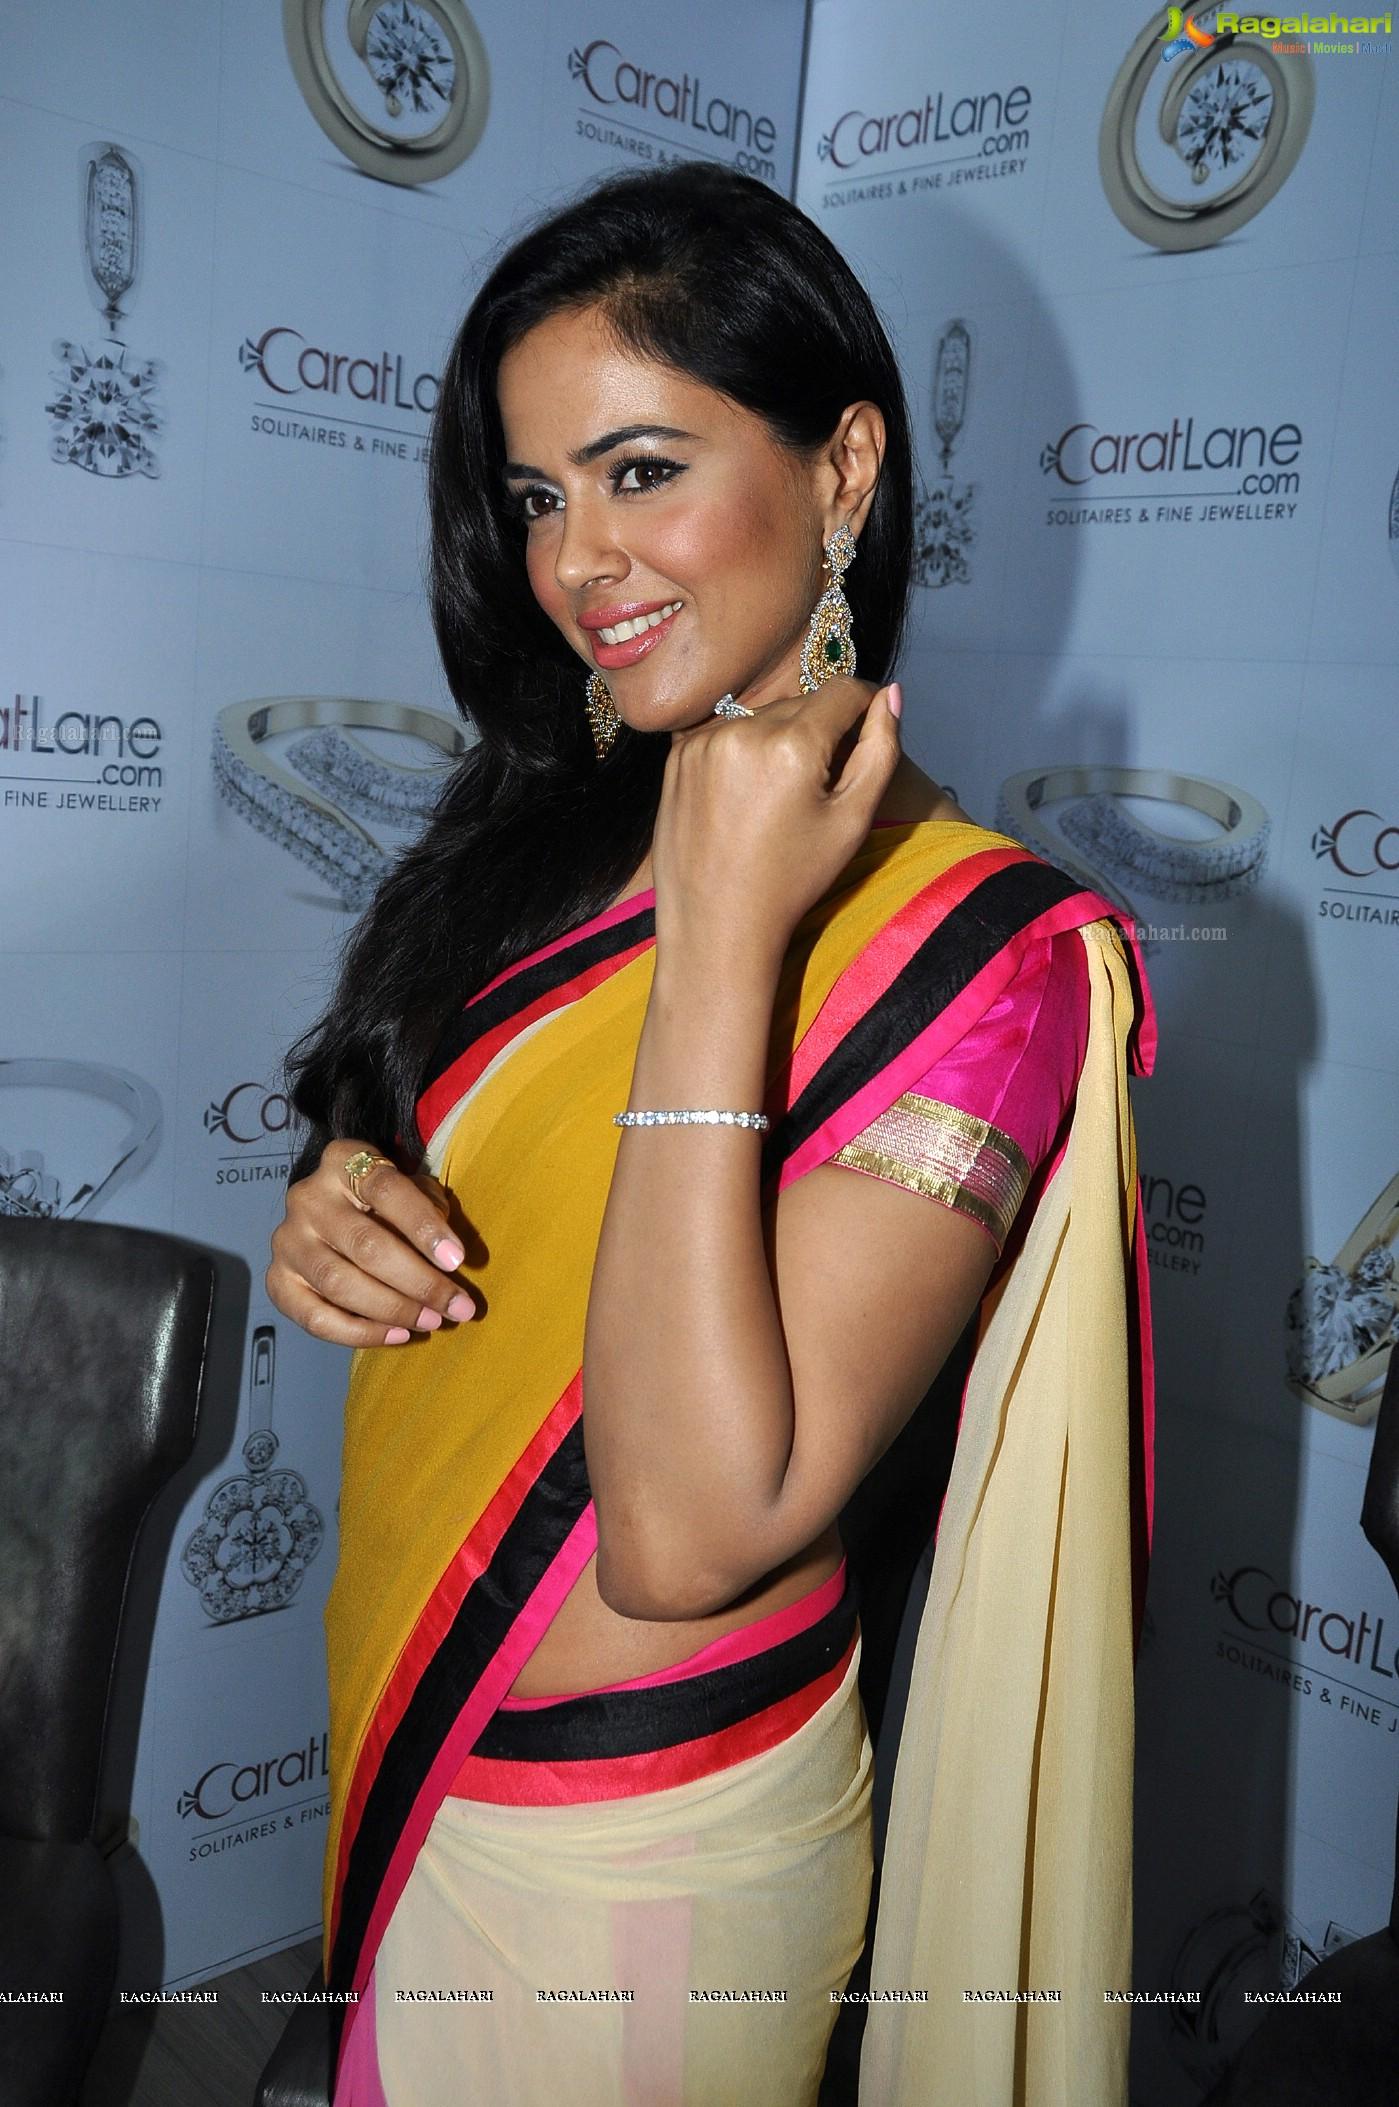 Sameera Reddy Posters Image 68 Telugu Actress Photosimages